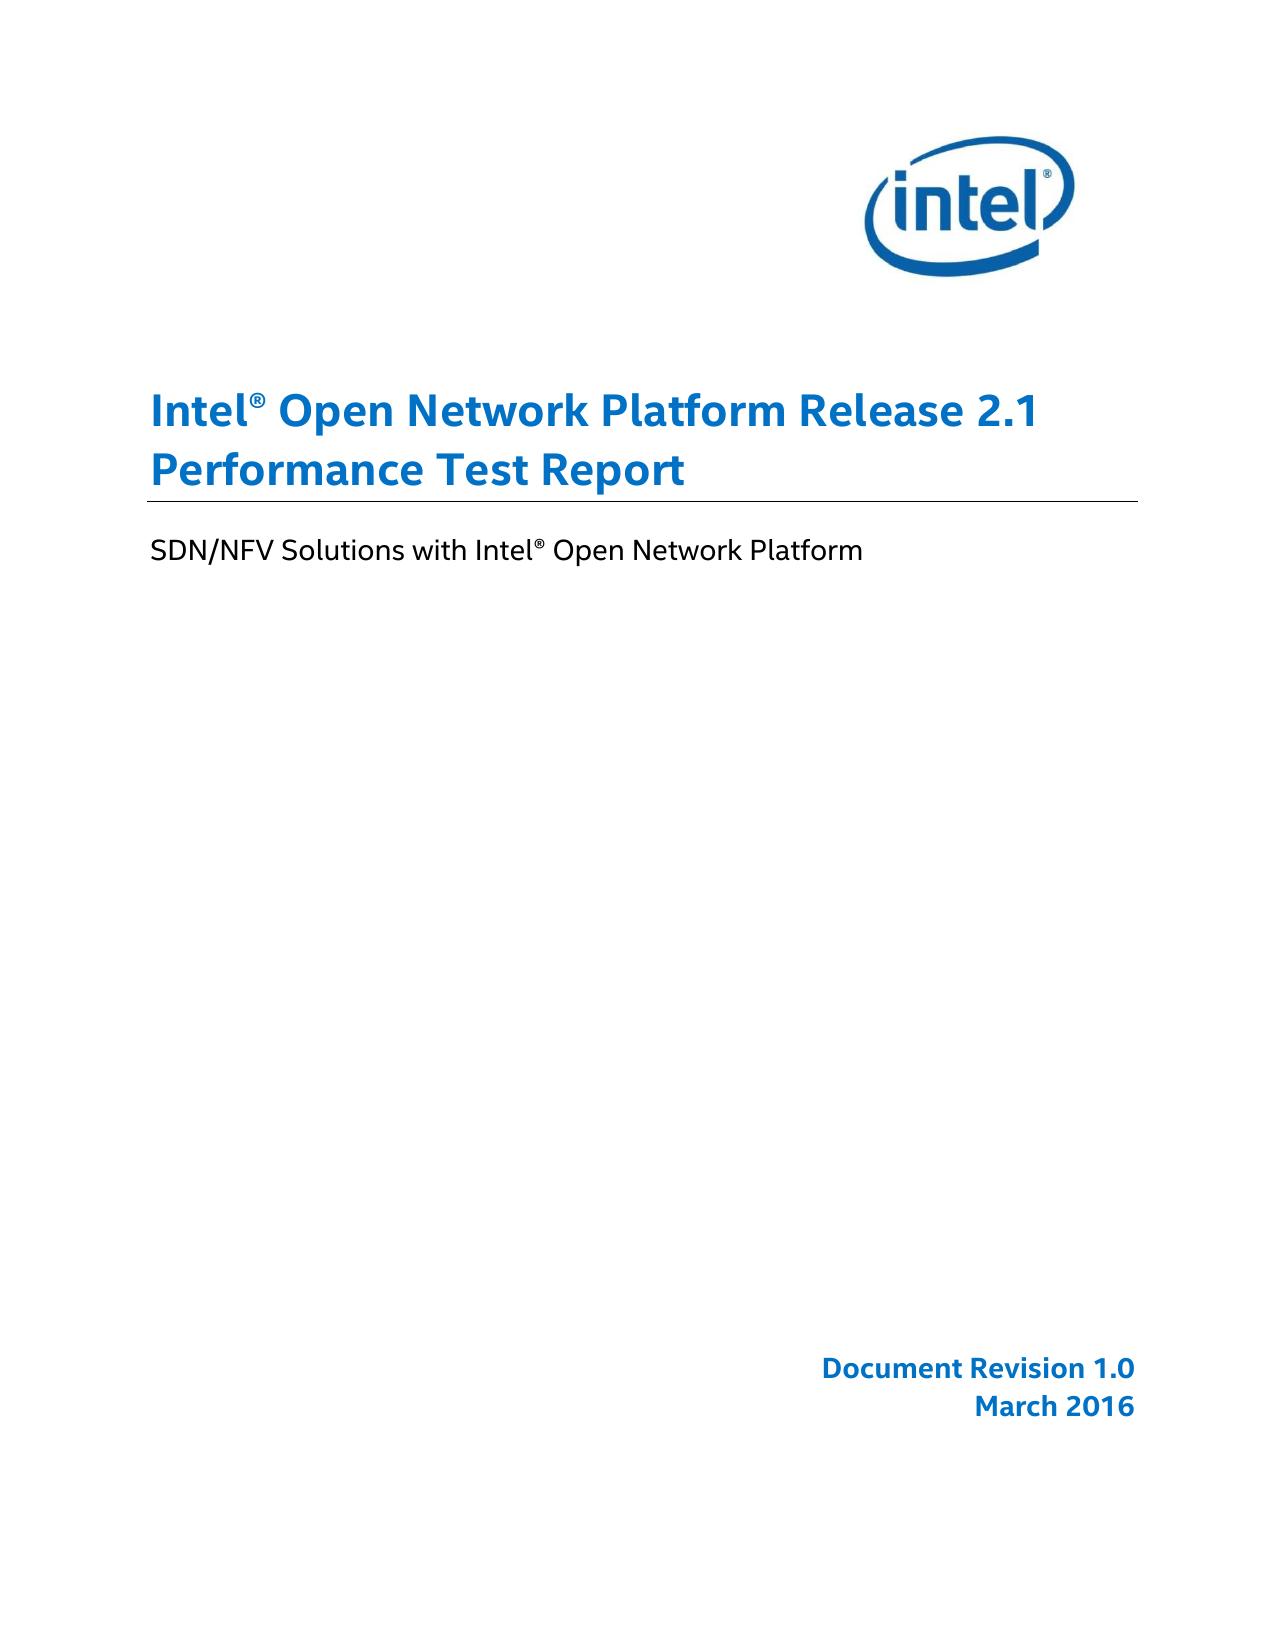 Intel® Open Network Platform Release 2 1 Performance - 01-logo